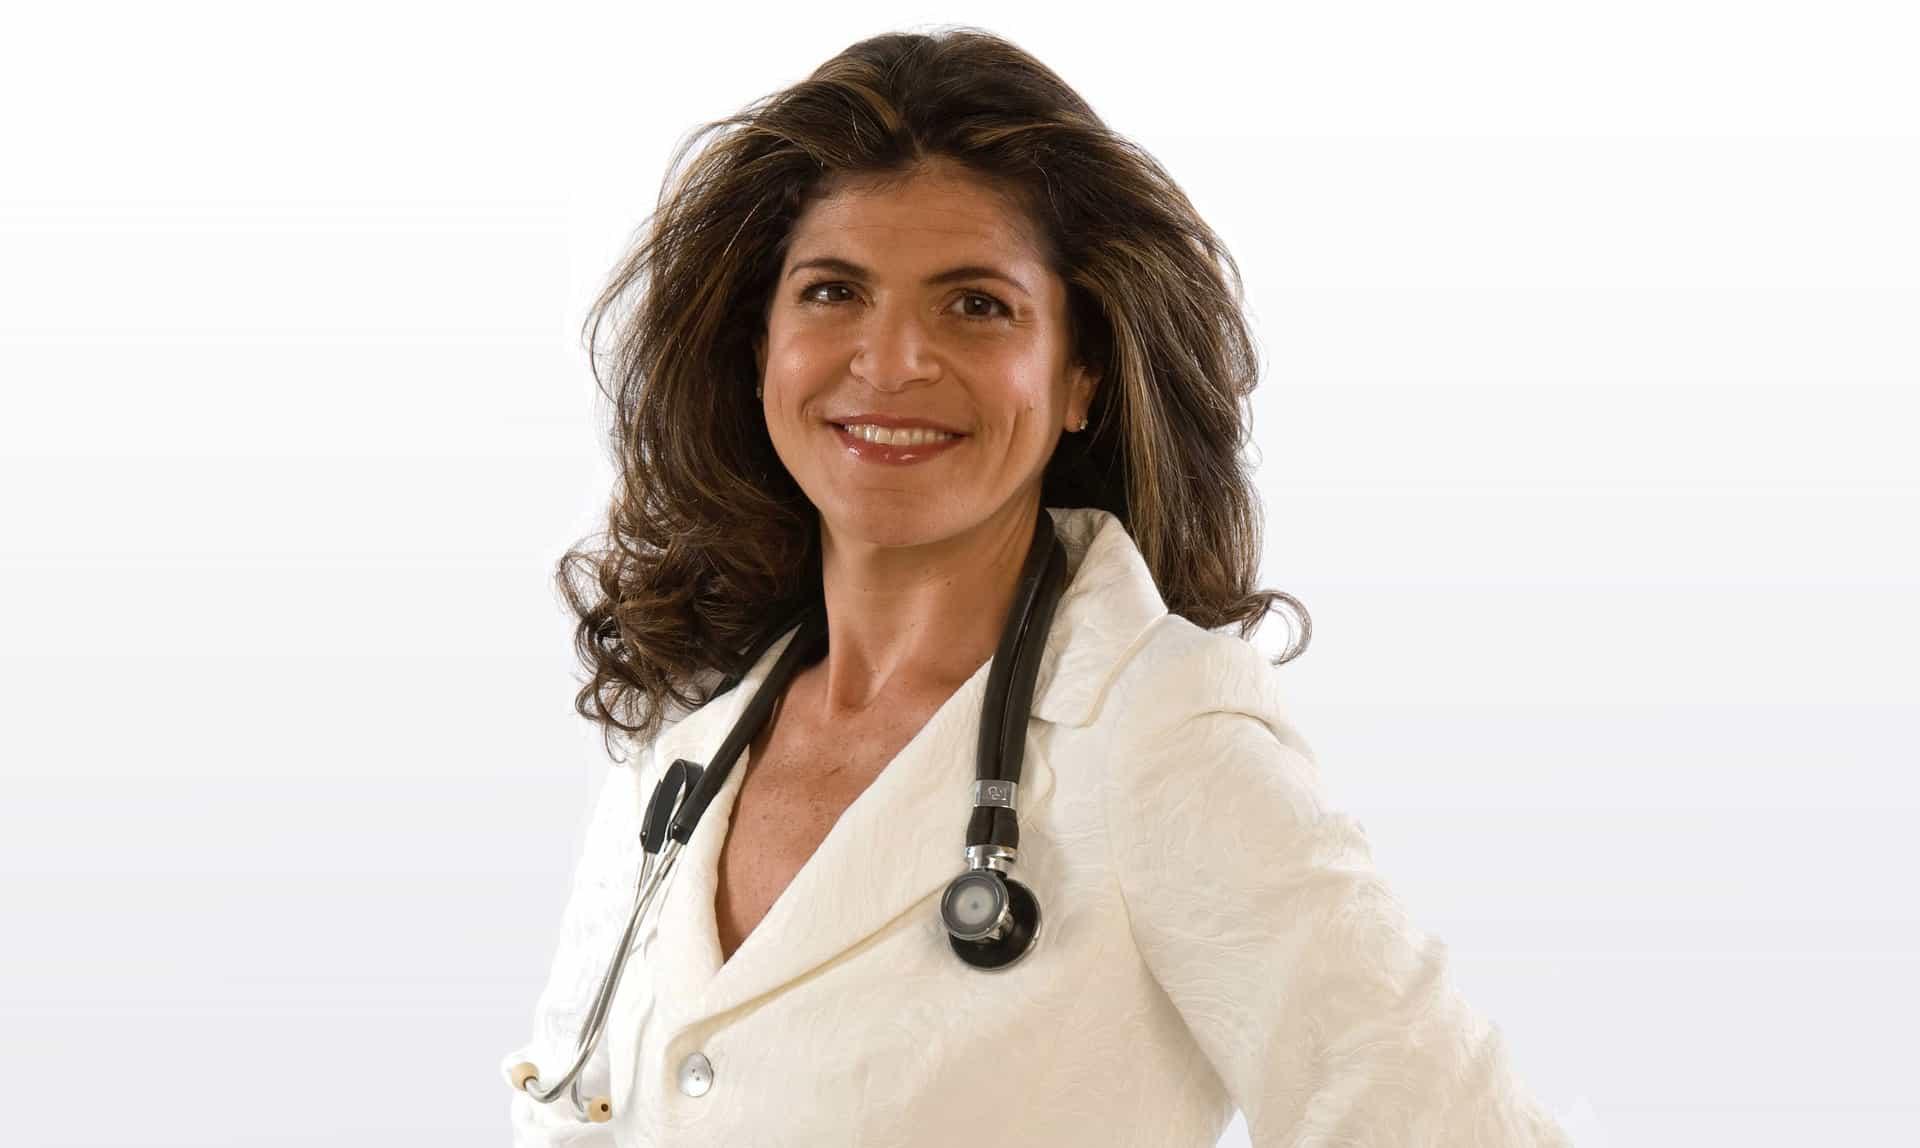 Dr. Eva Selhub Corporate